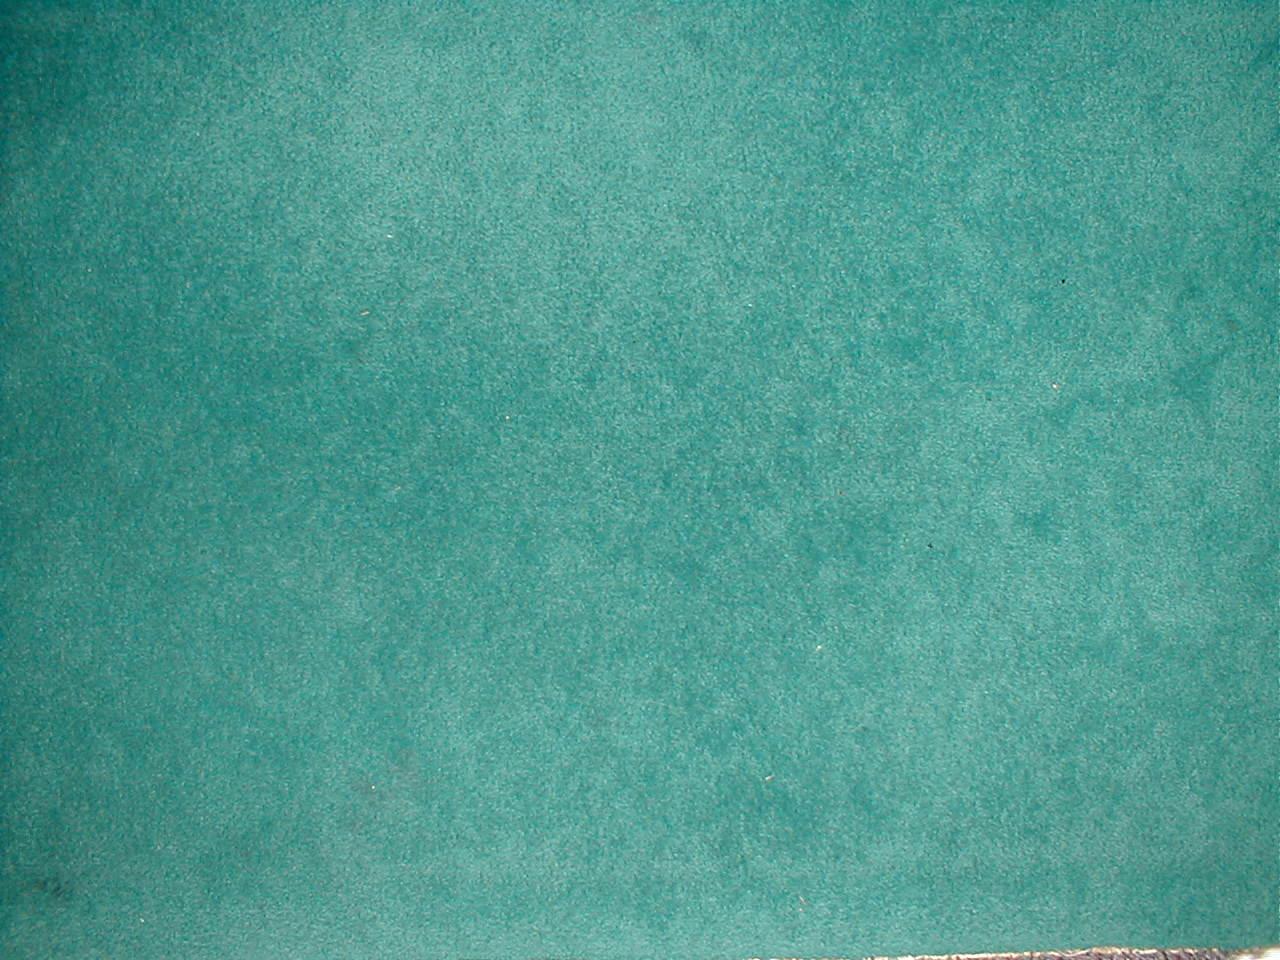 Teal Carpet Texture By Dougnaka On Deviantart